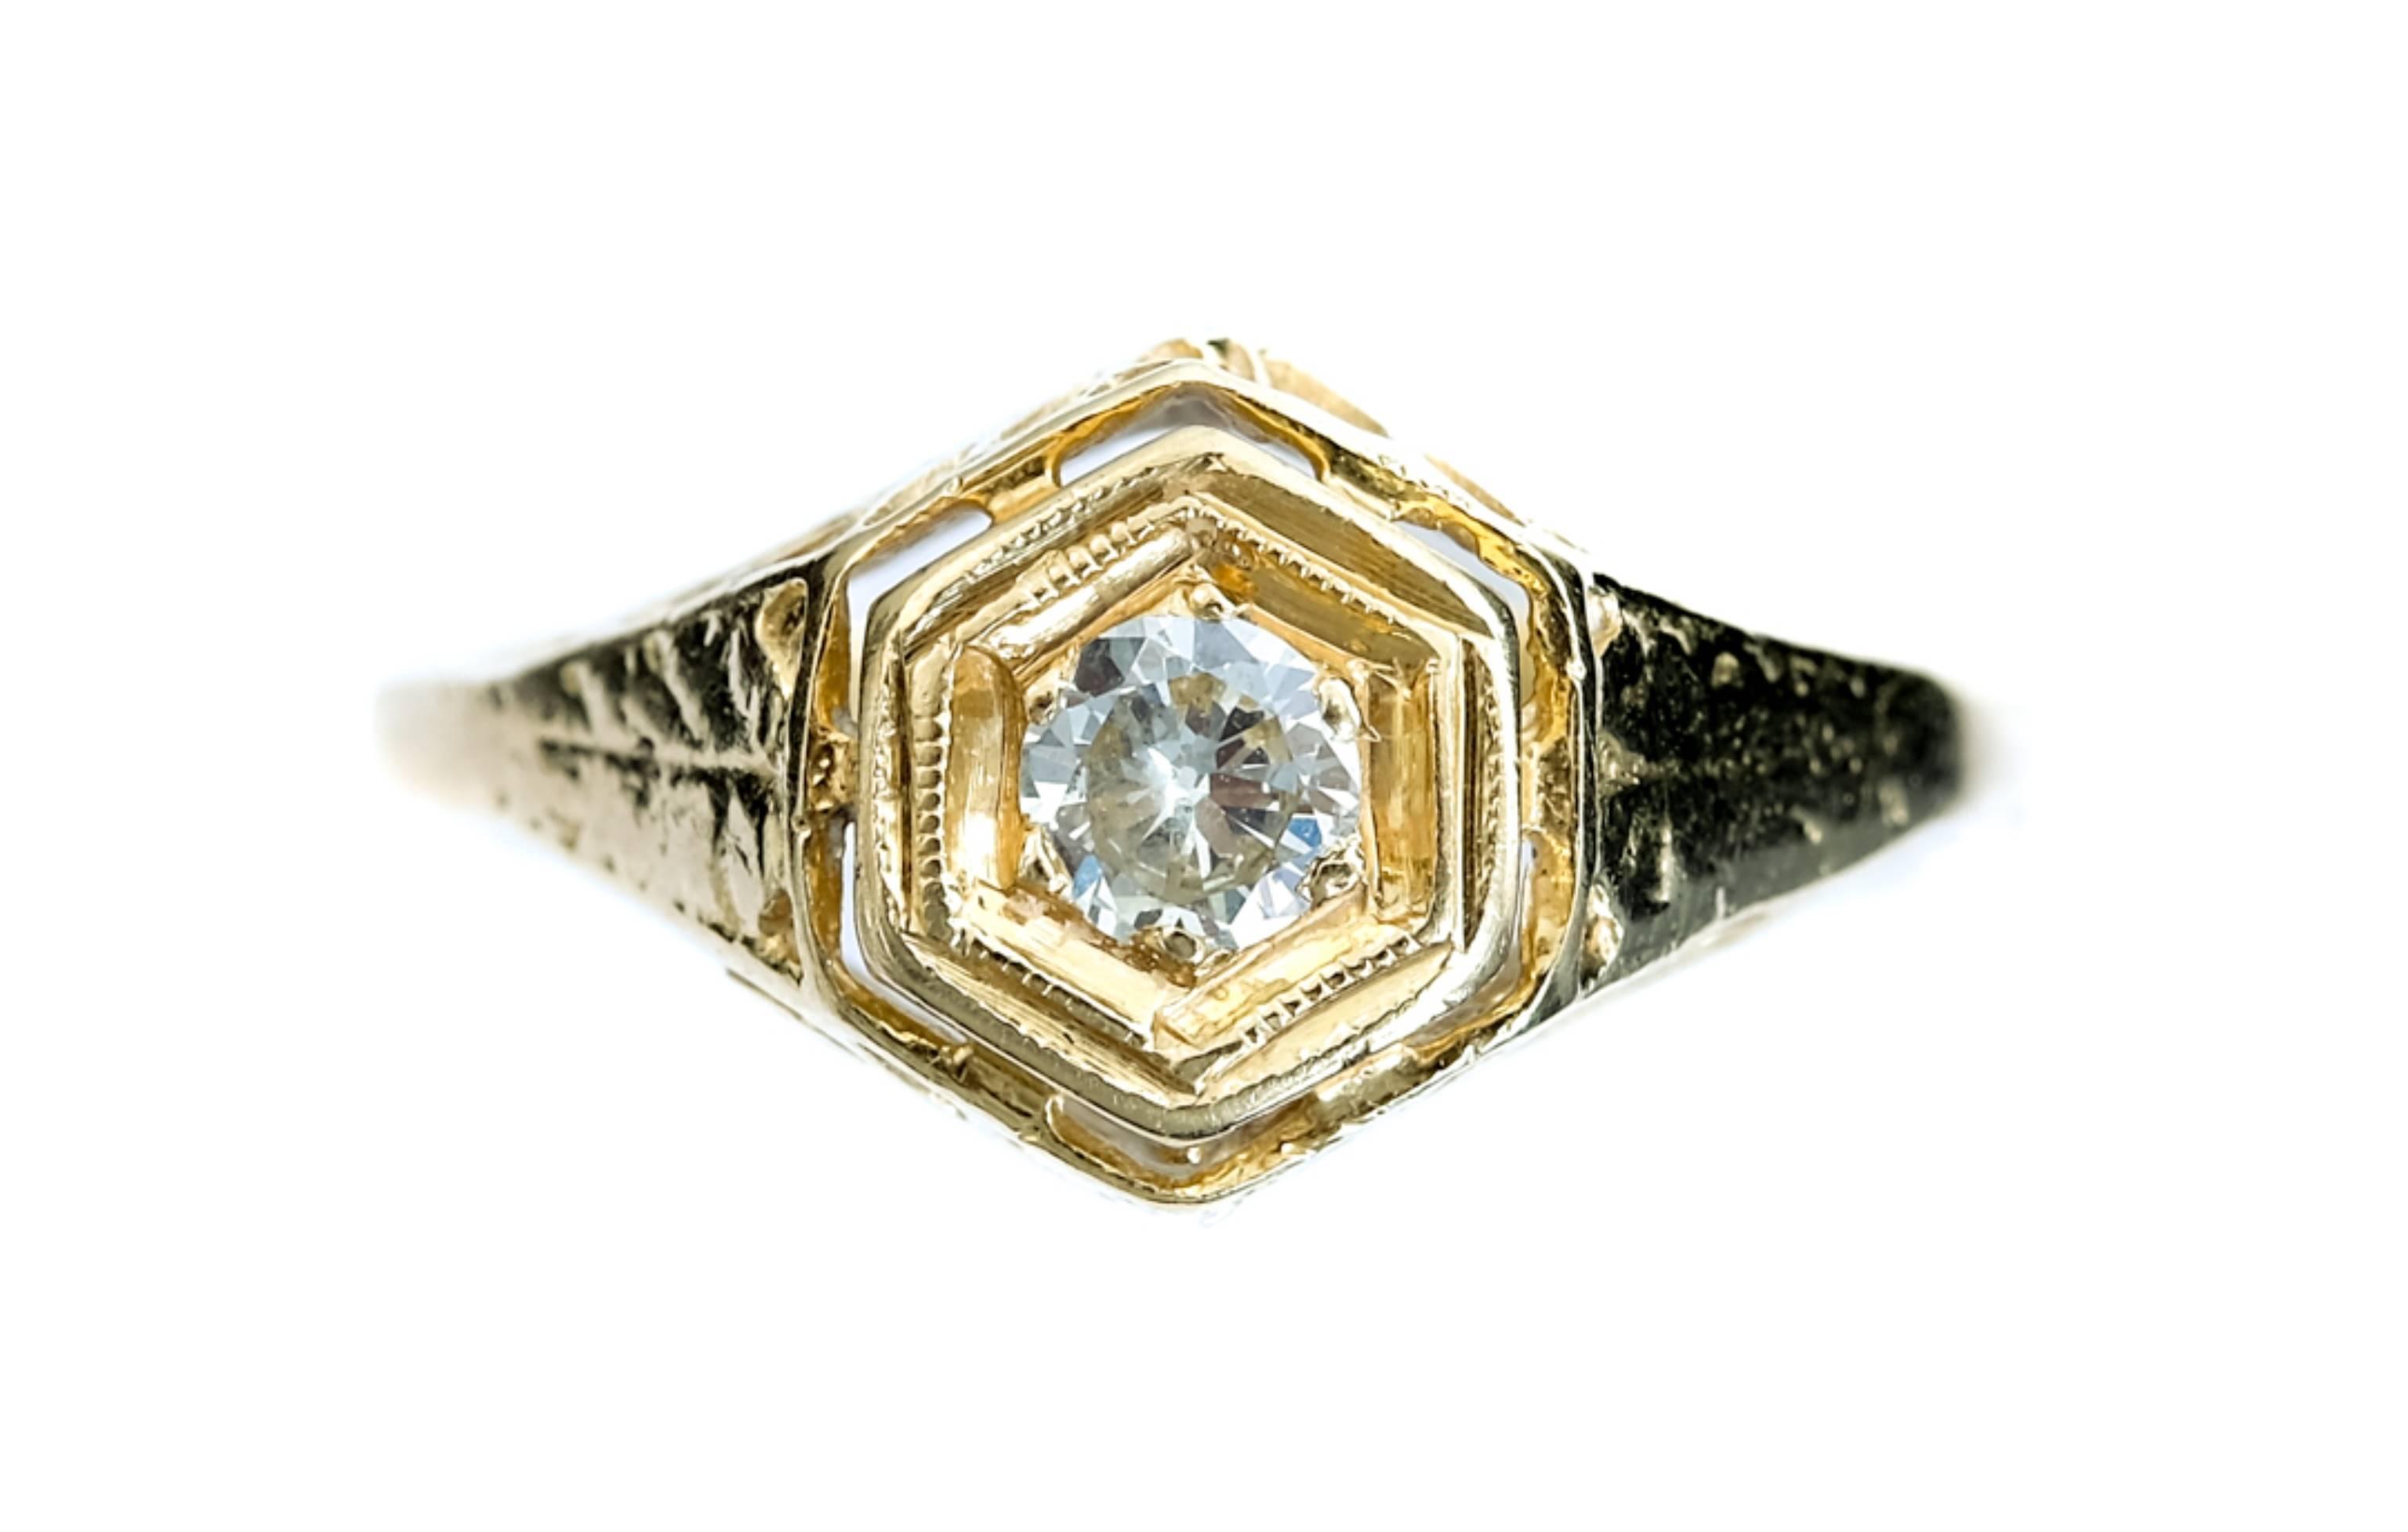 14k Yellow Gold & Diamond Ring size 4